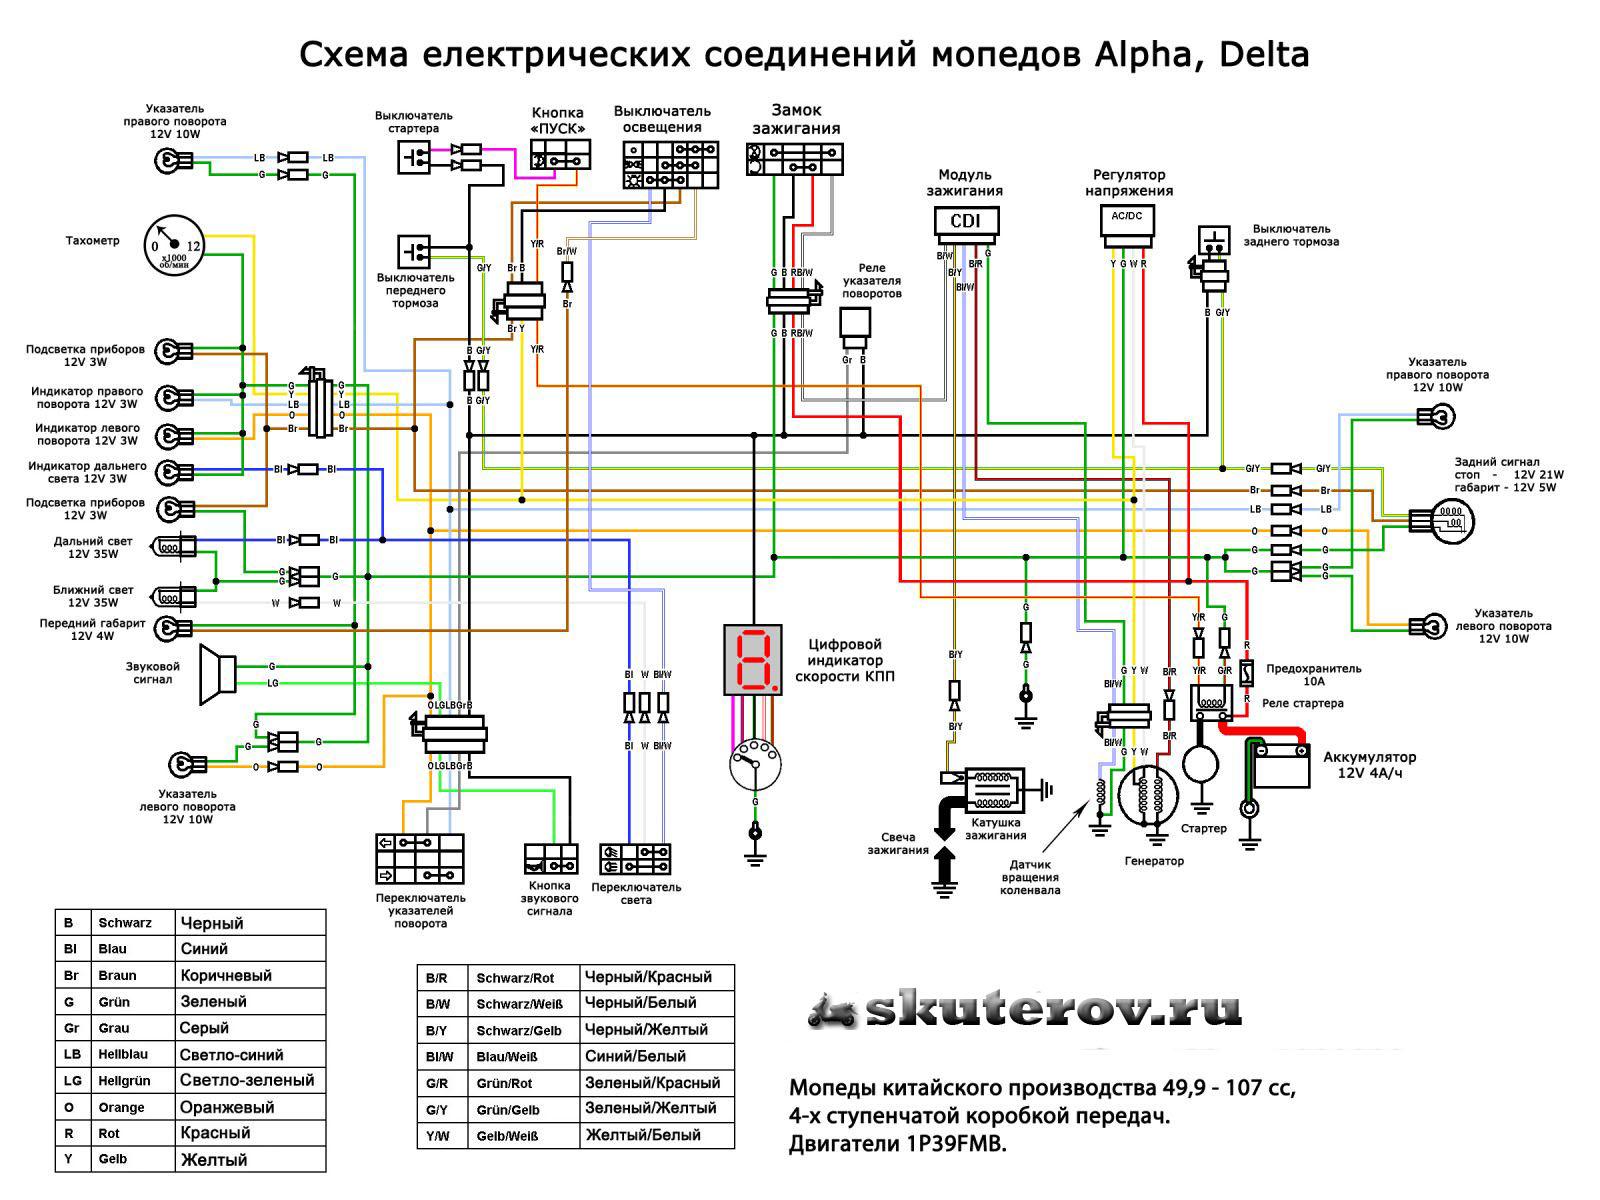 """,""pagekran.ru"